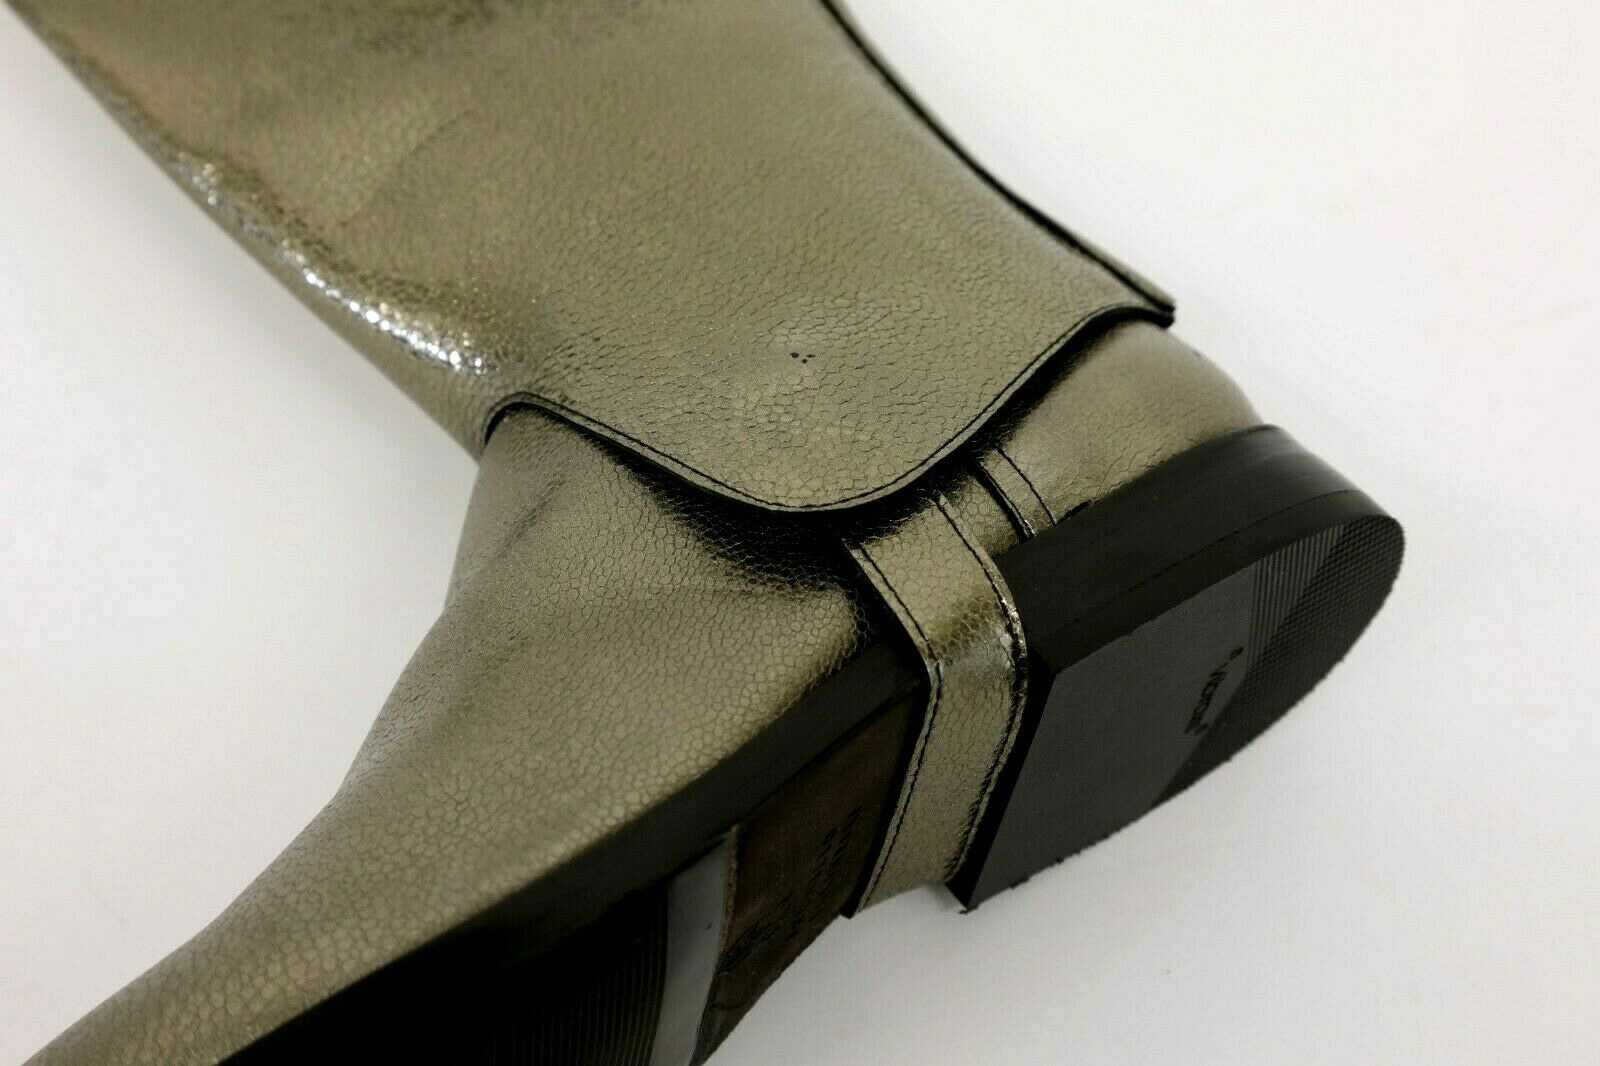 NWOB 2995 Brunello Cucinelli Metallic Leather Leather Leather Stirrup + Chelsea Stiefel 37 7US A191 6ff536